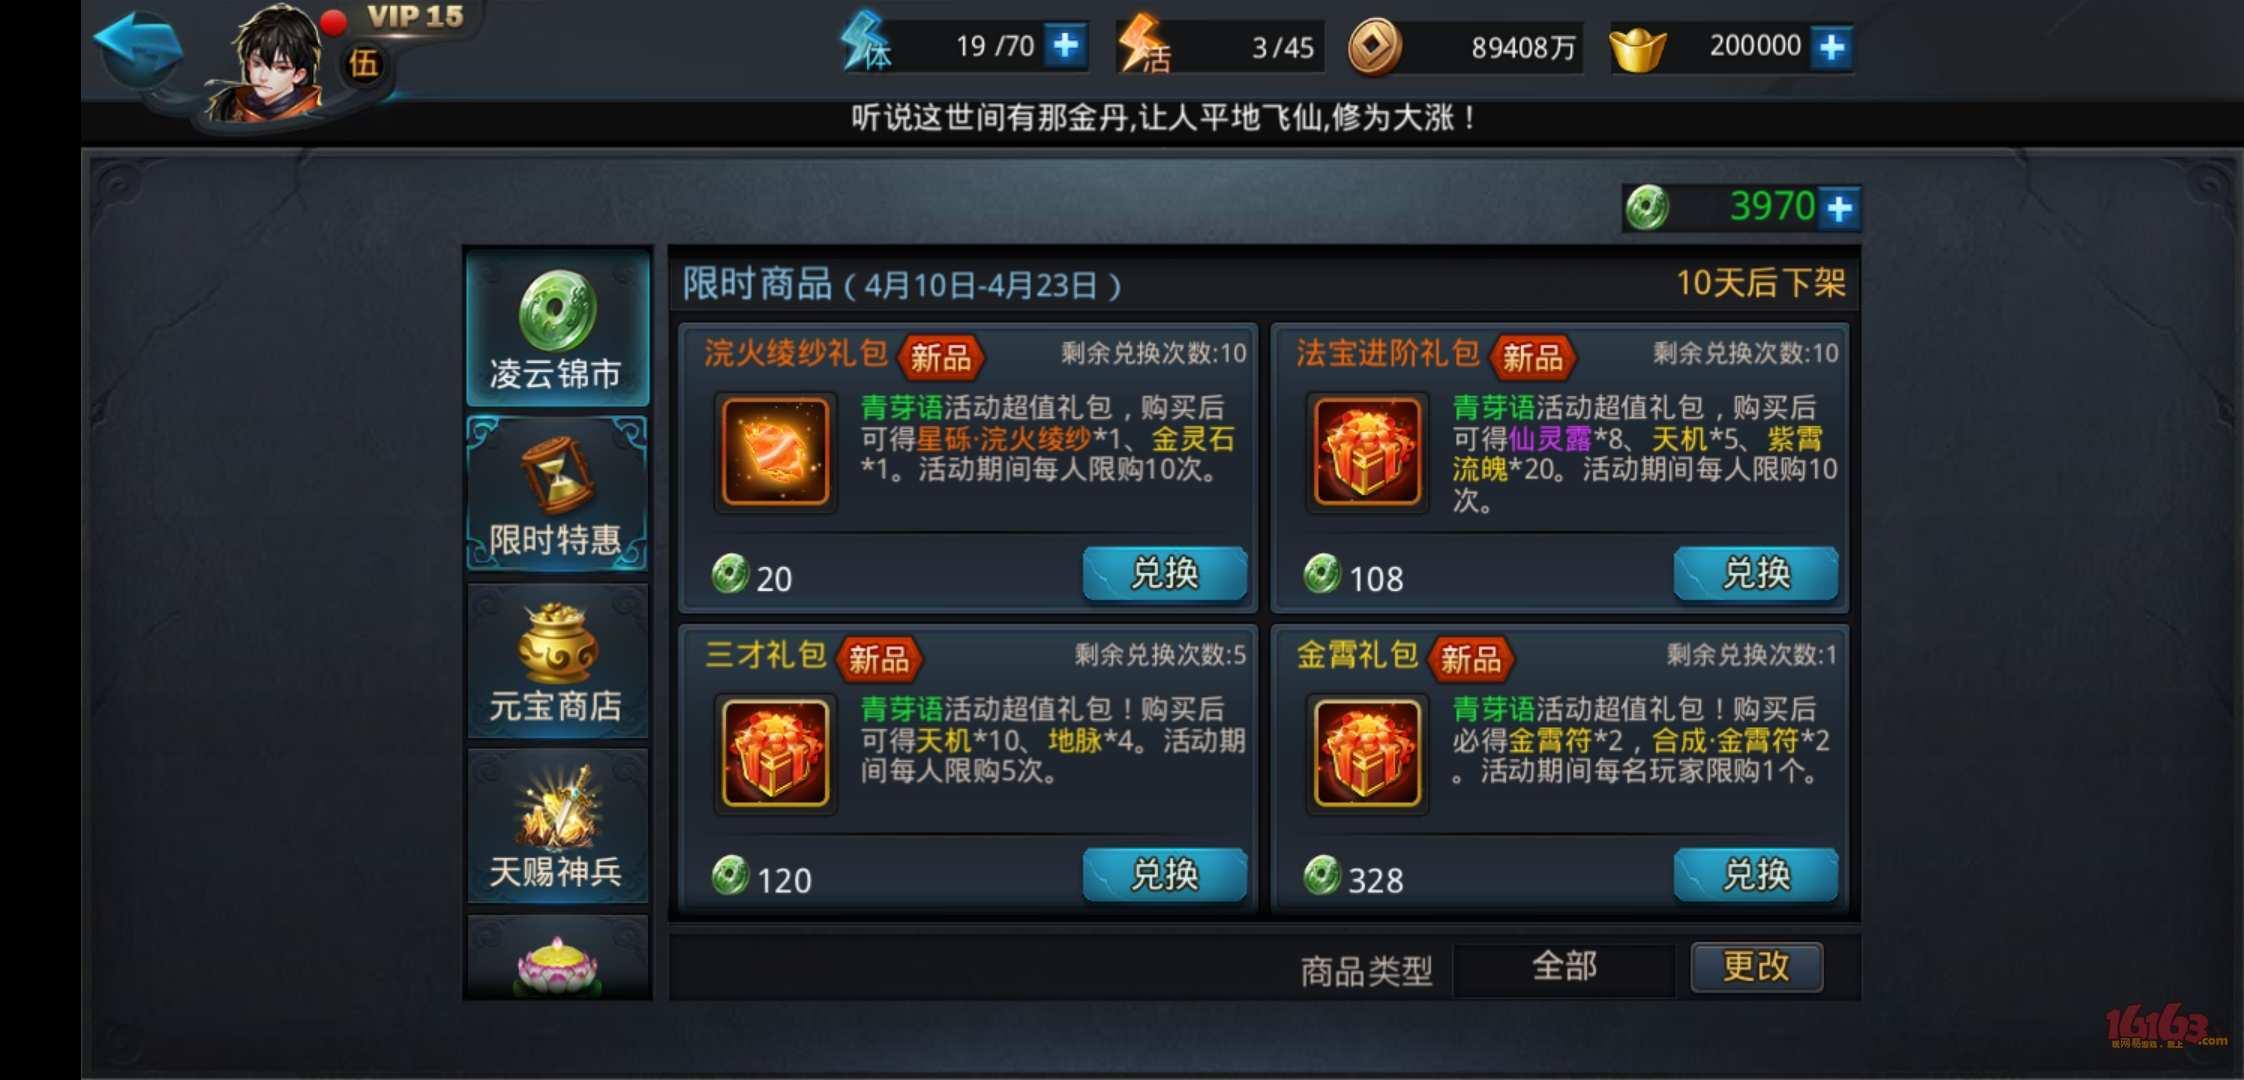 Screenshot_20190413_210314_com.netease.ldxy.uc.jpg